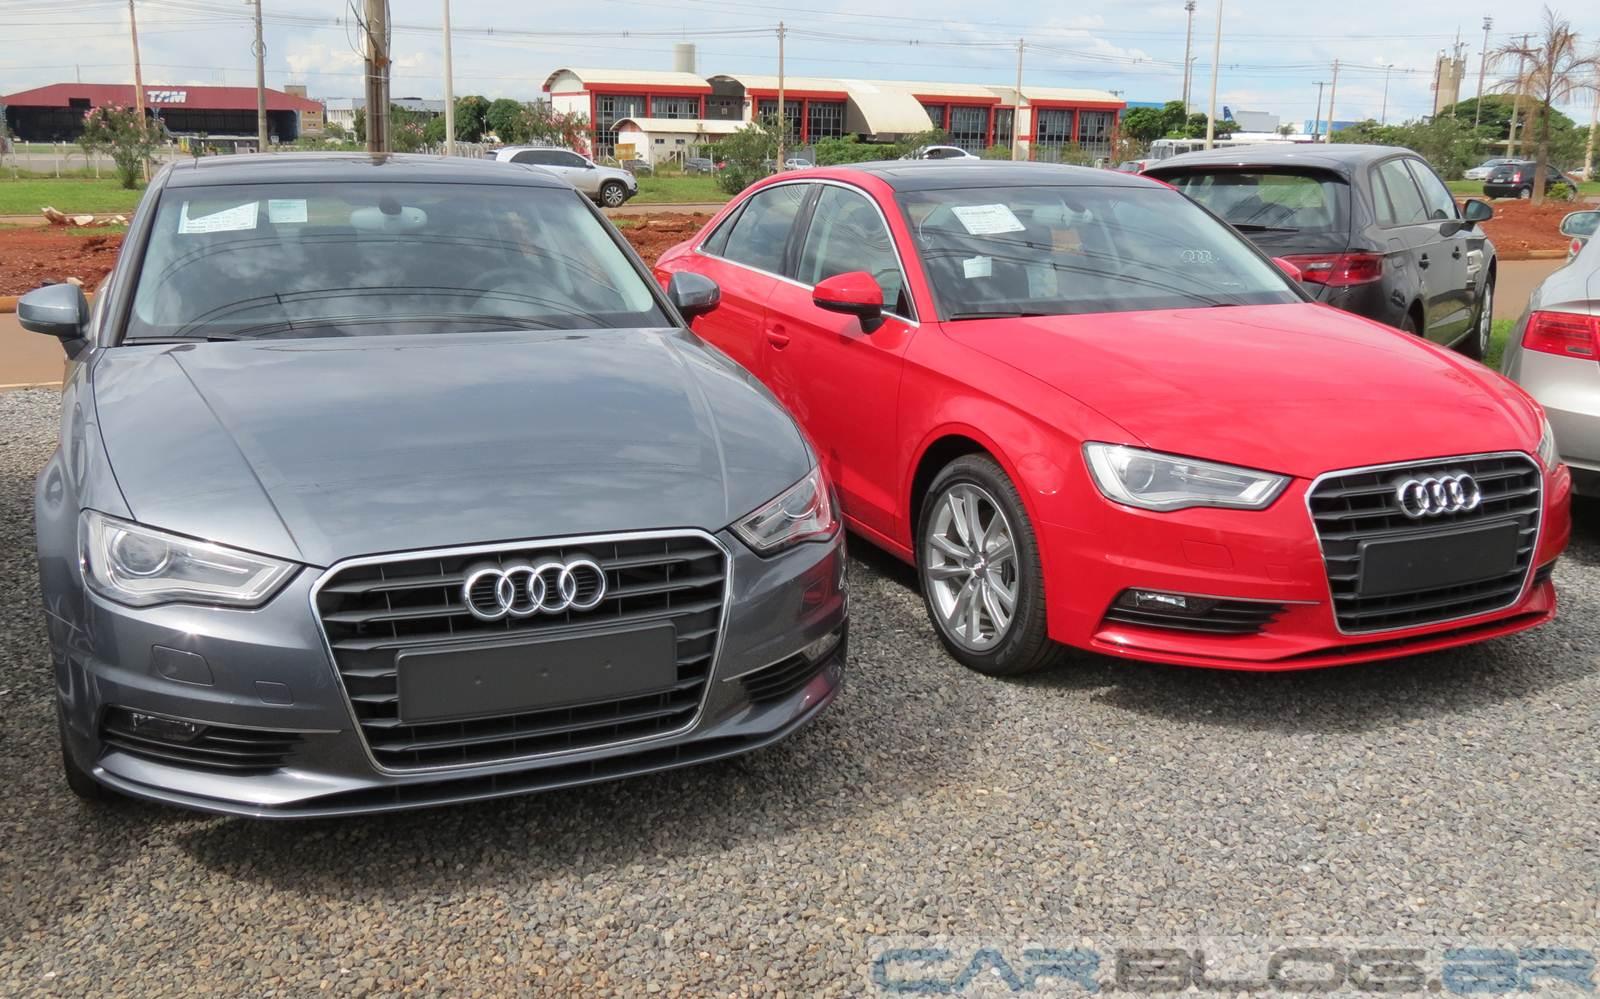 Novo Audi A3 Sedan